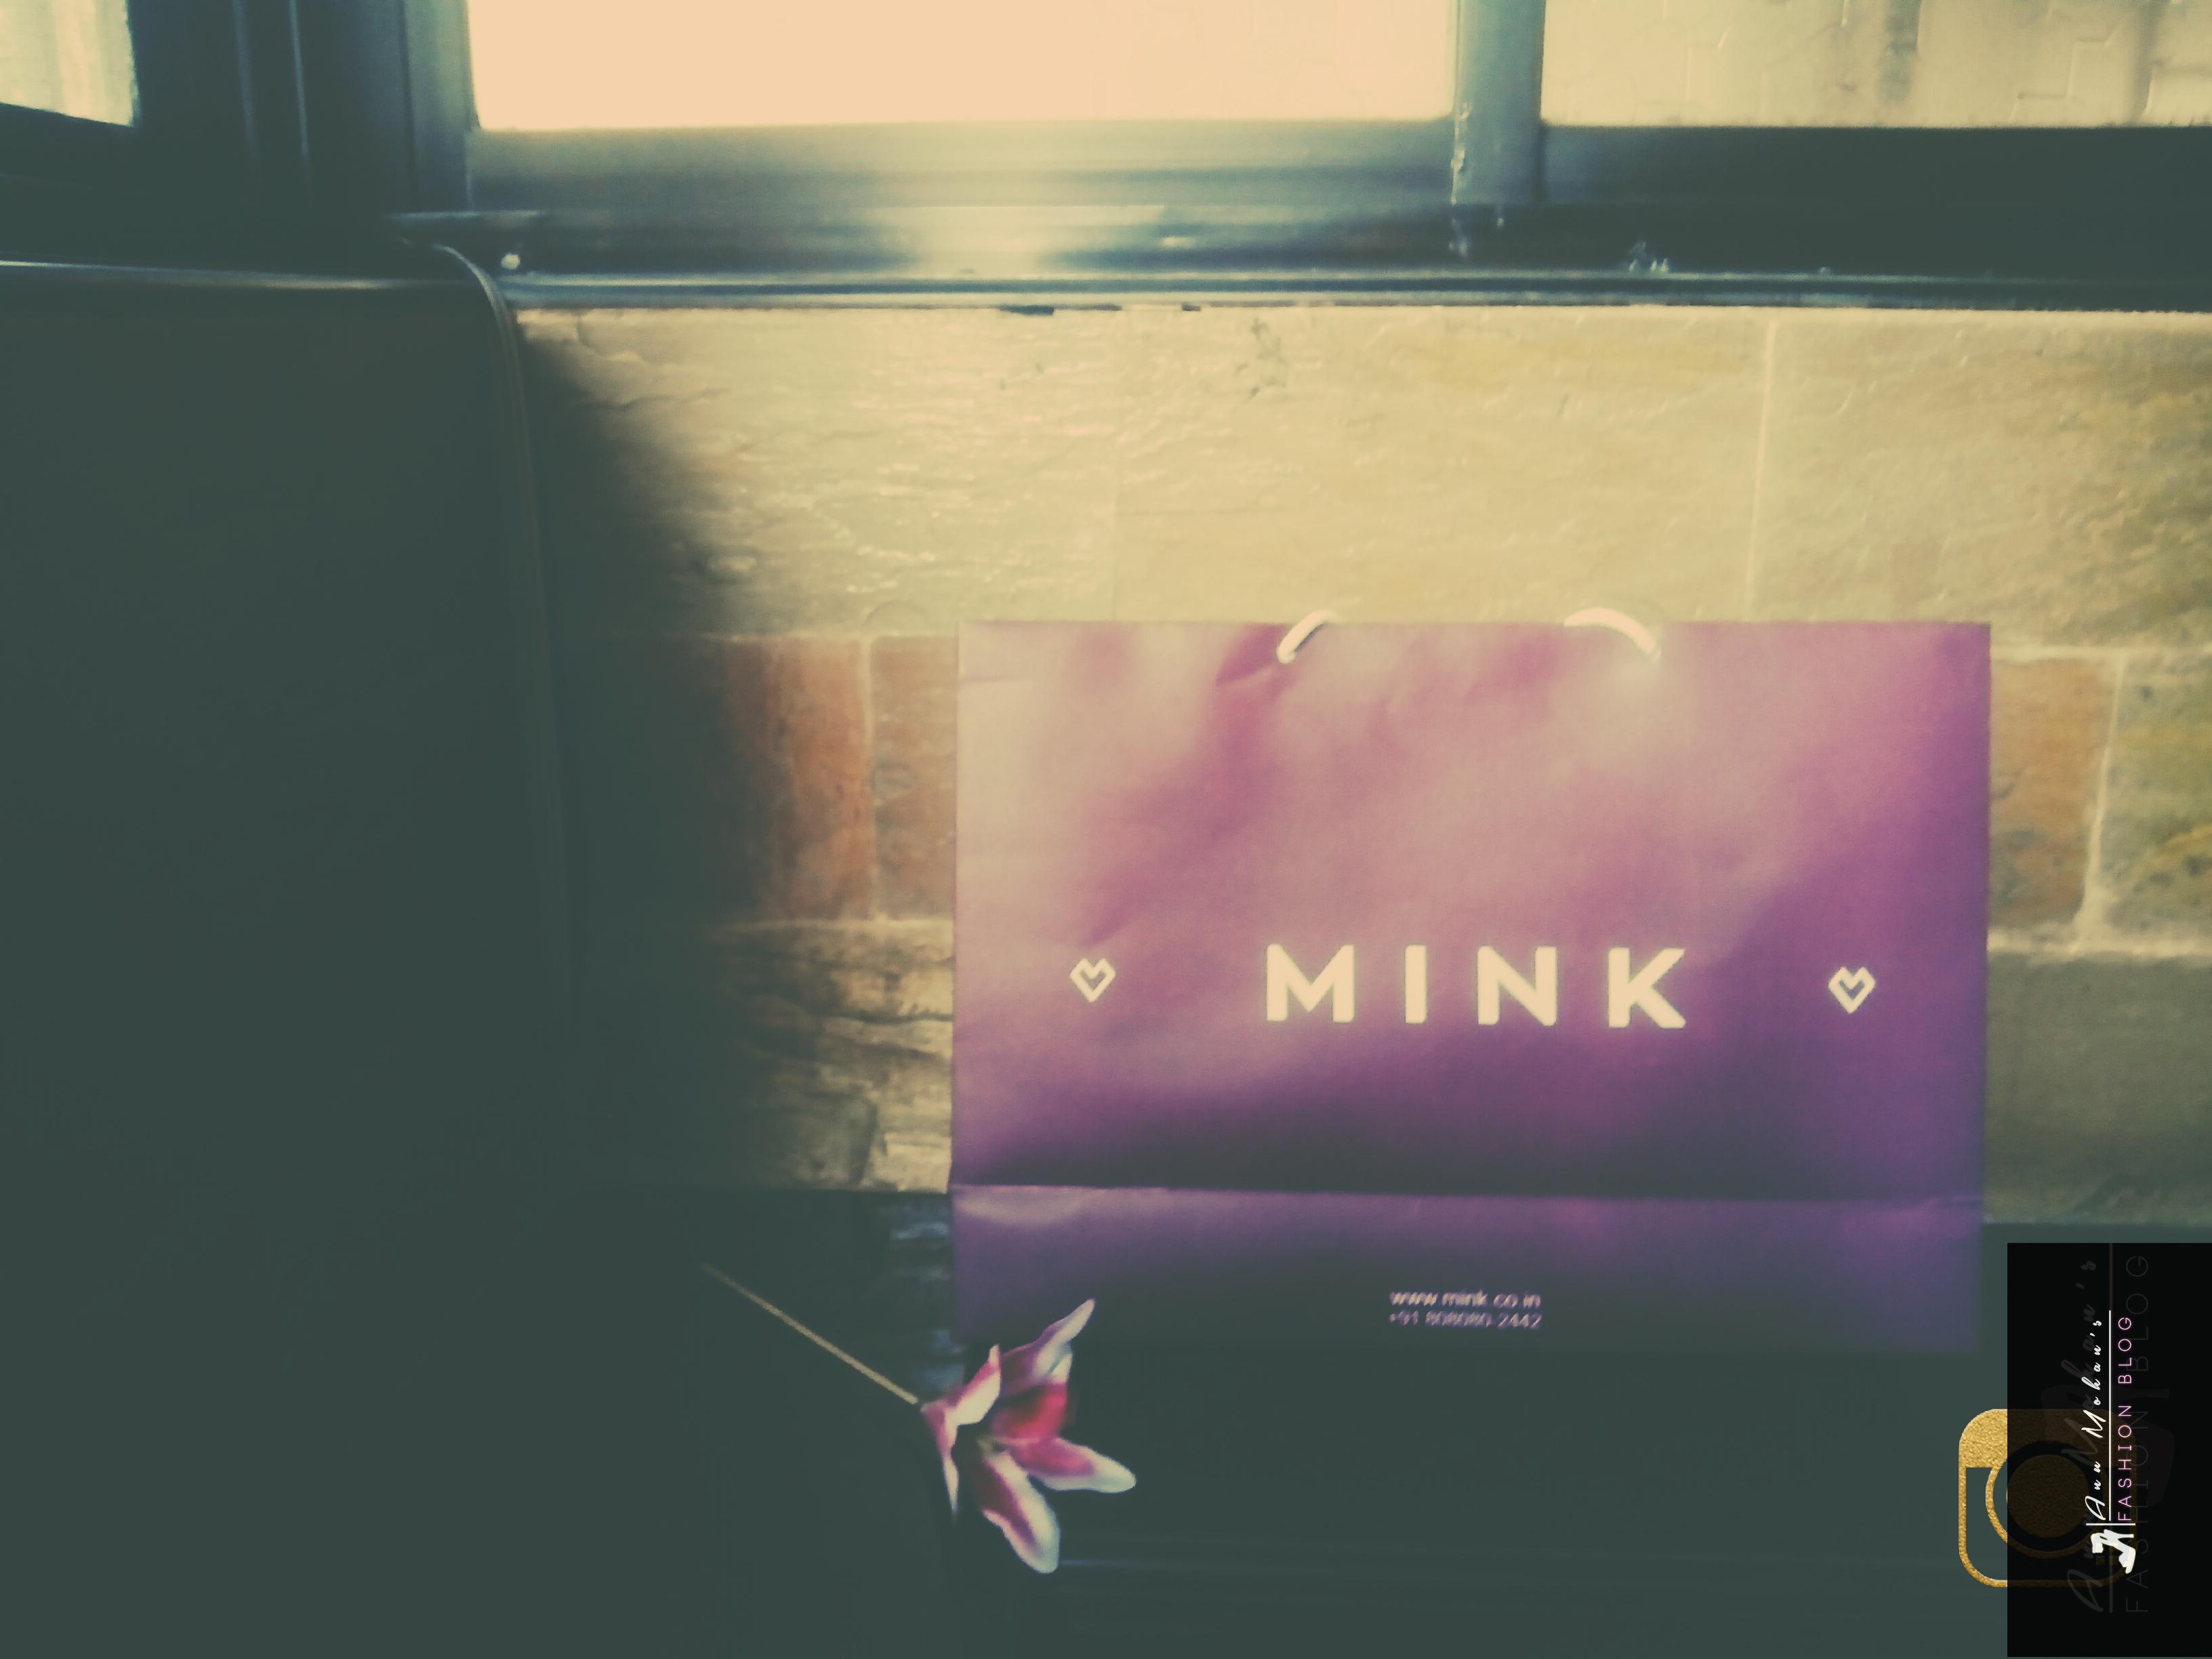 Mink Laundry